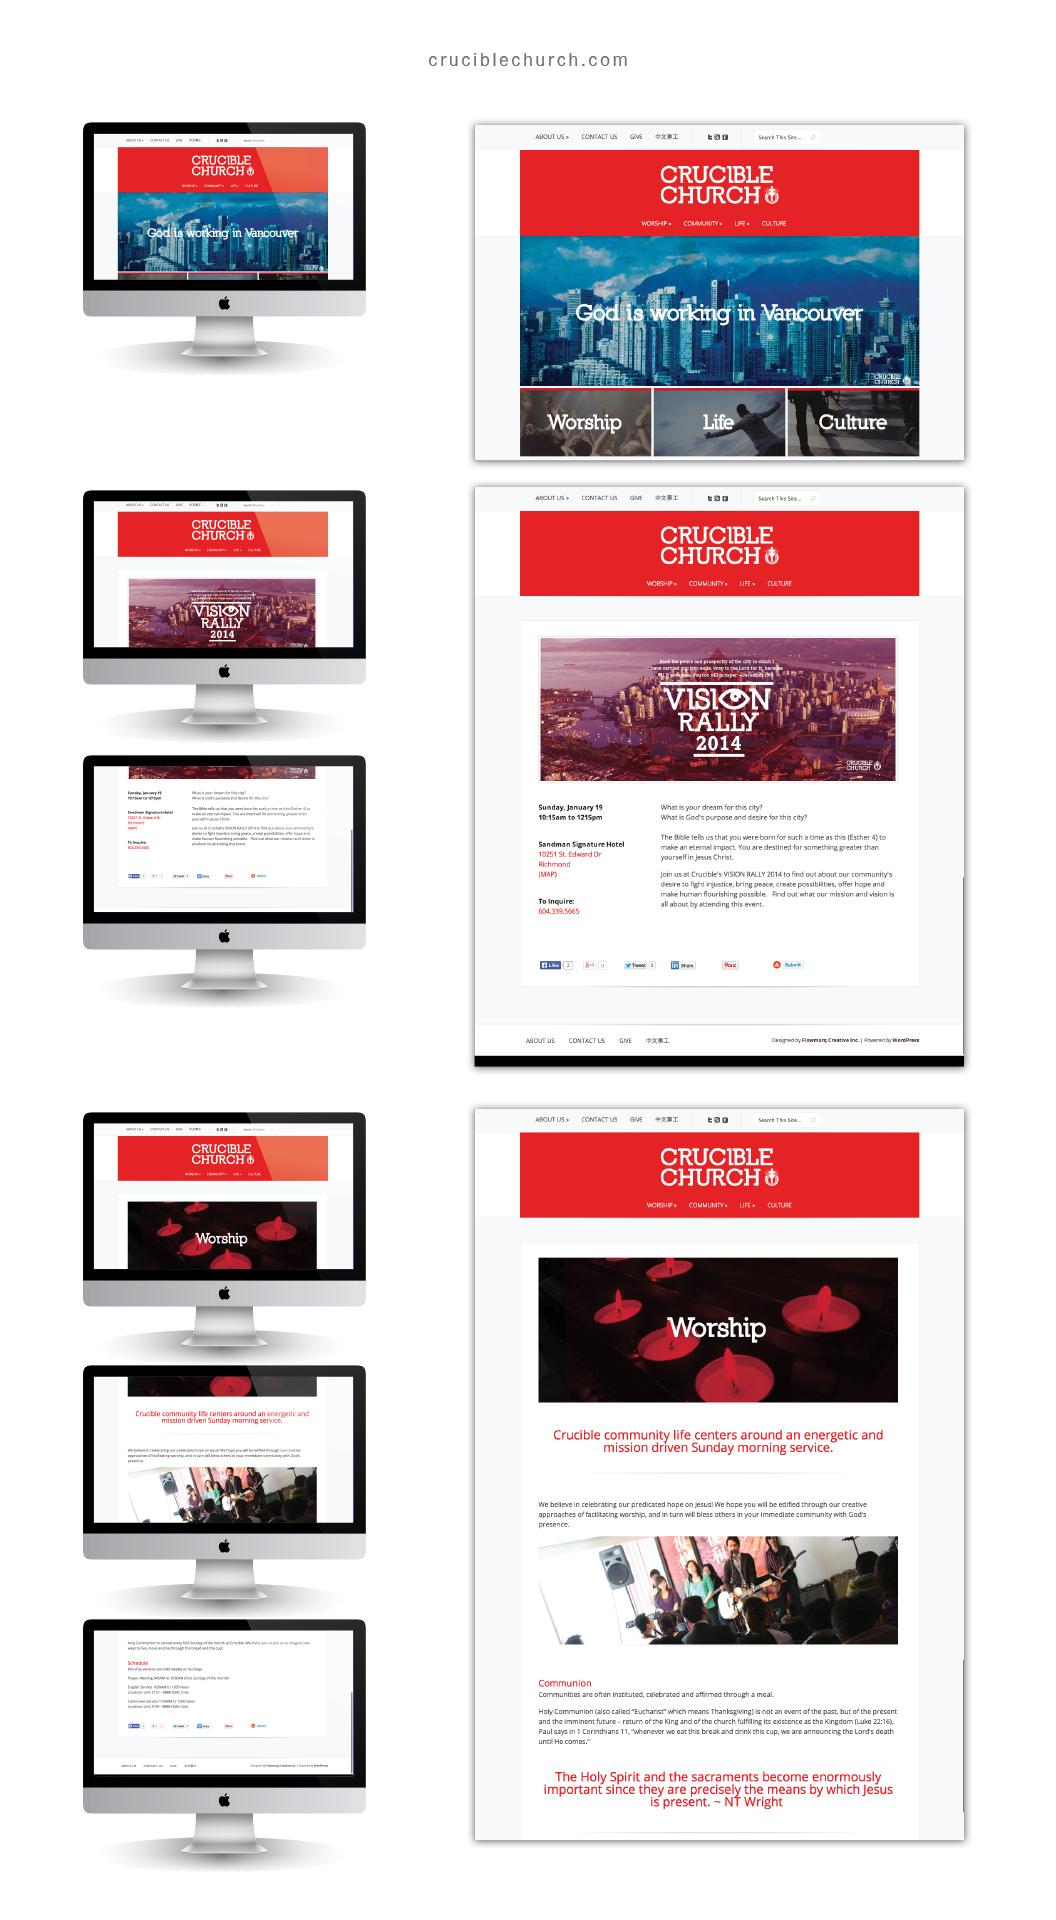 Crucible Church Website & Social Media - Church Branding Design